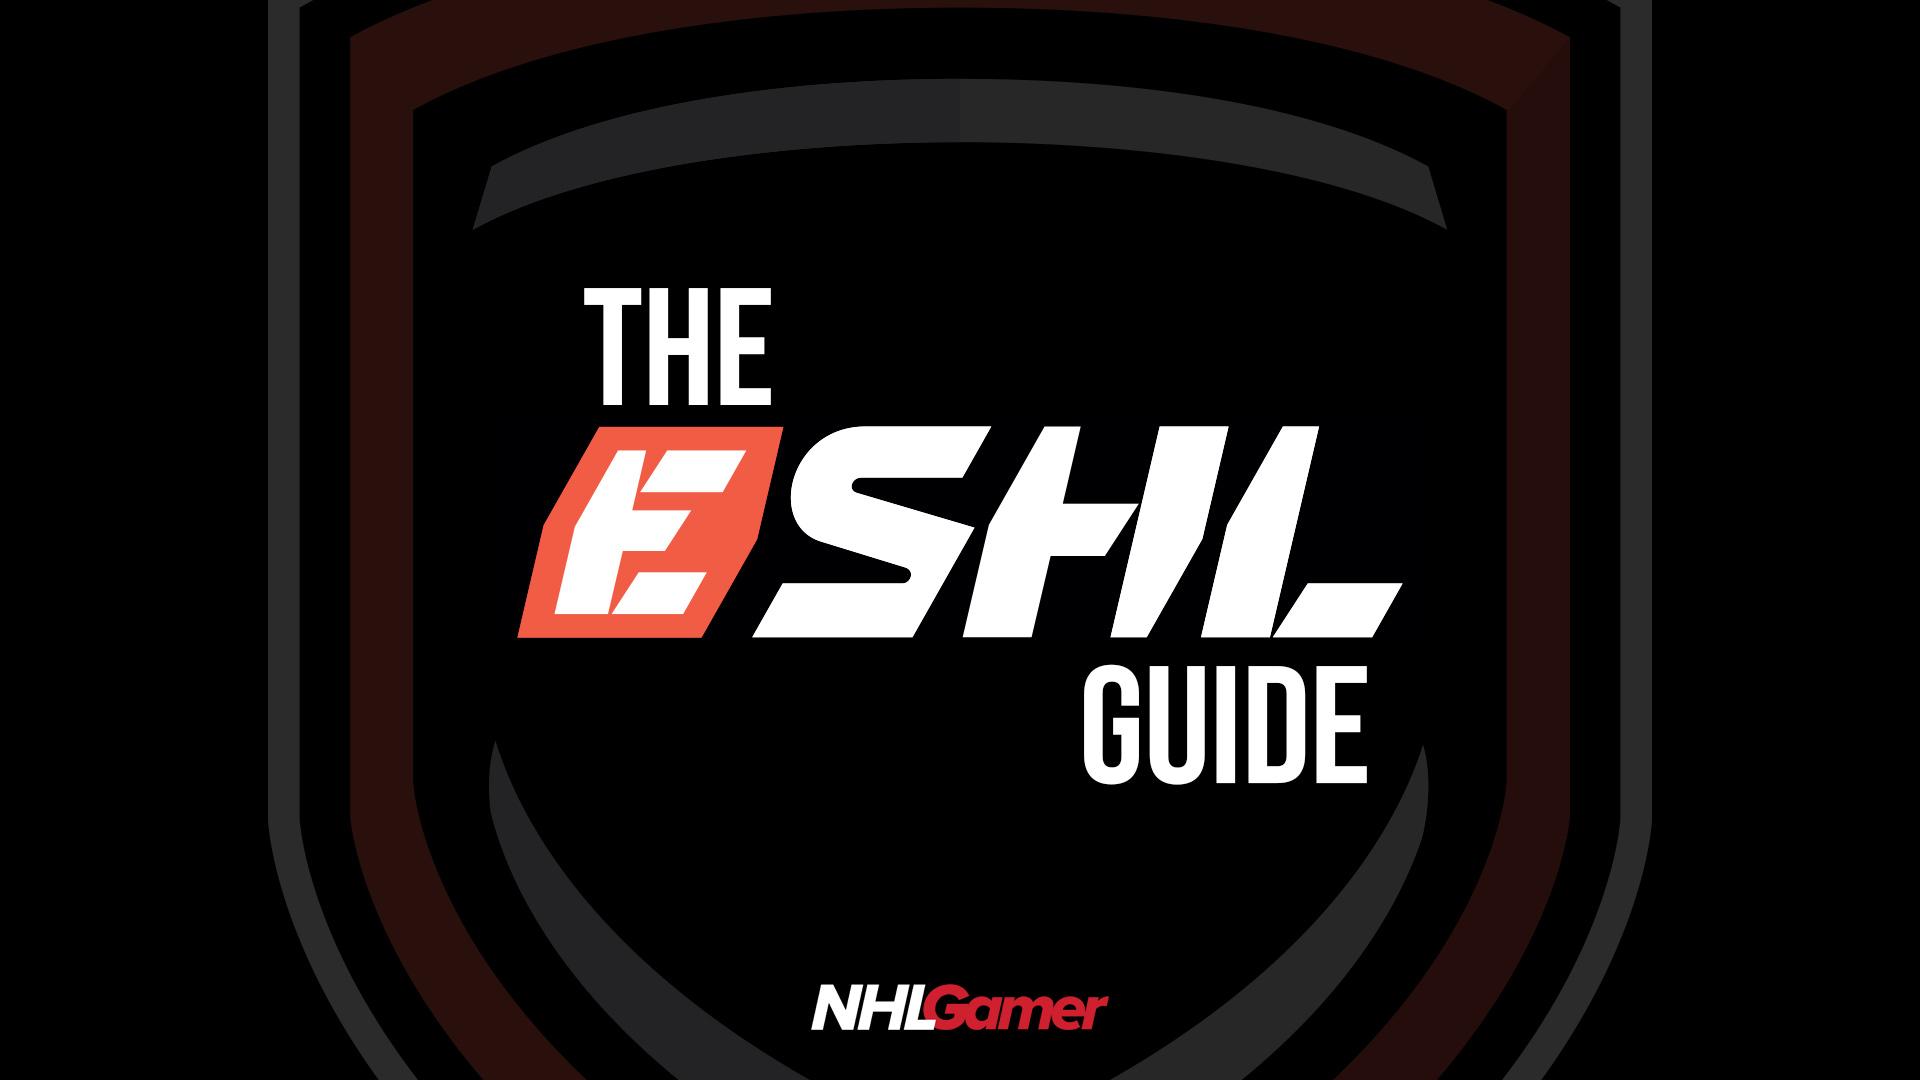 The_eSHL_Guide_by_NHLGamer.jpg